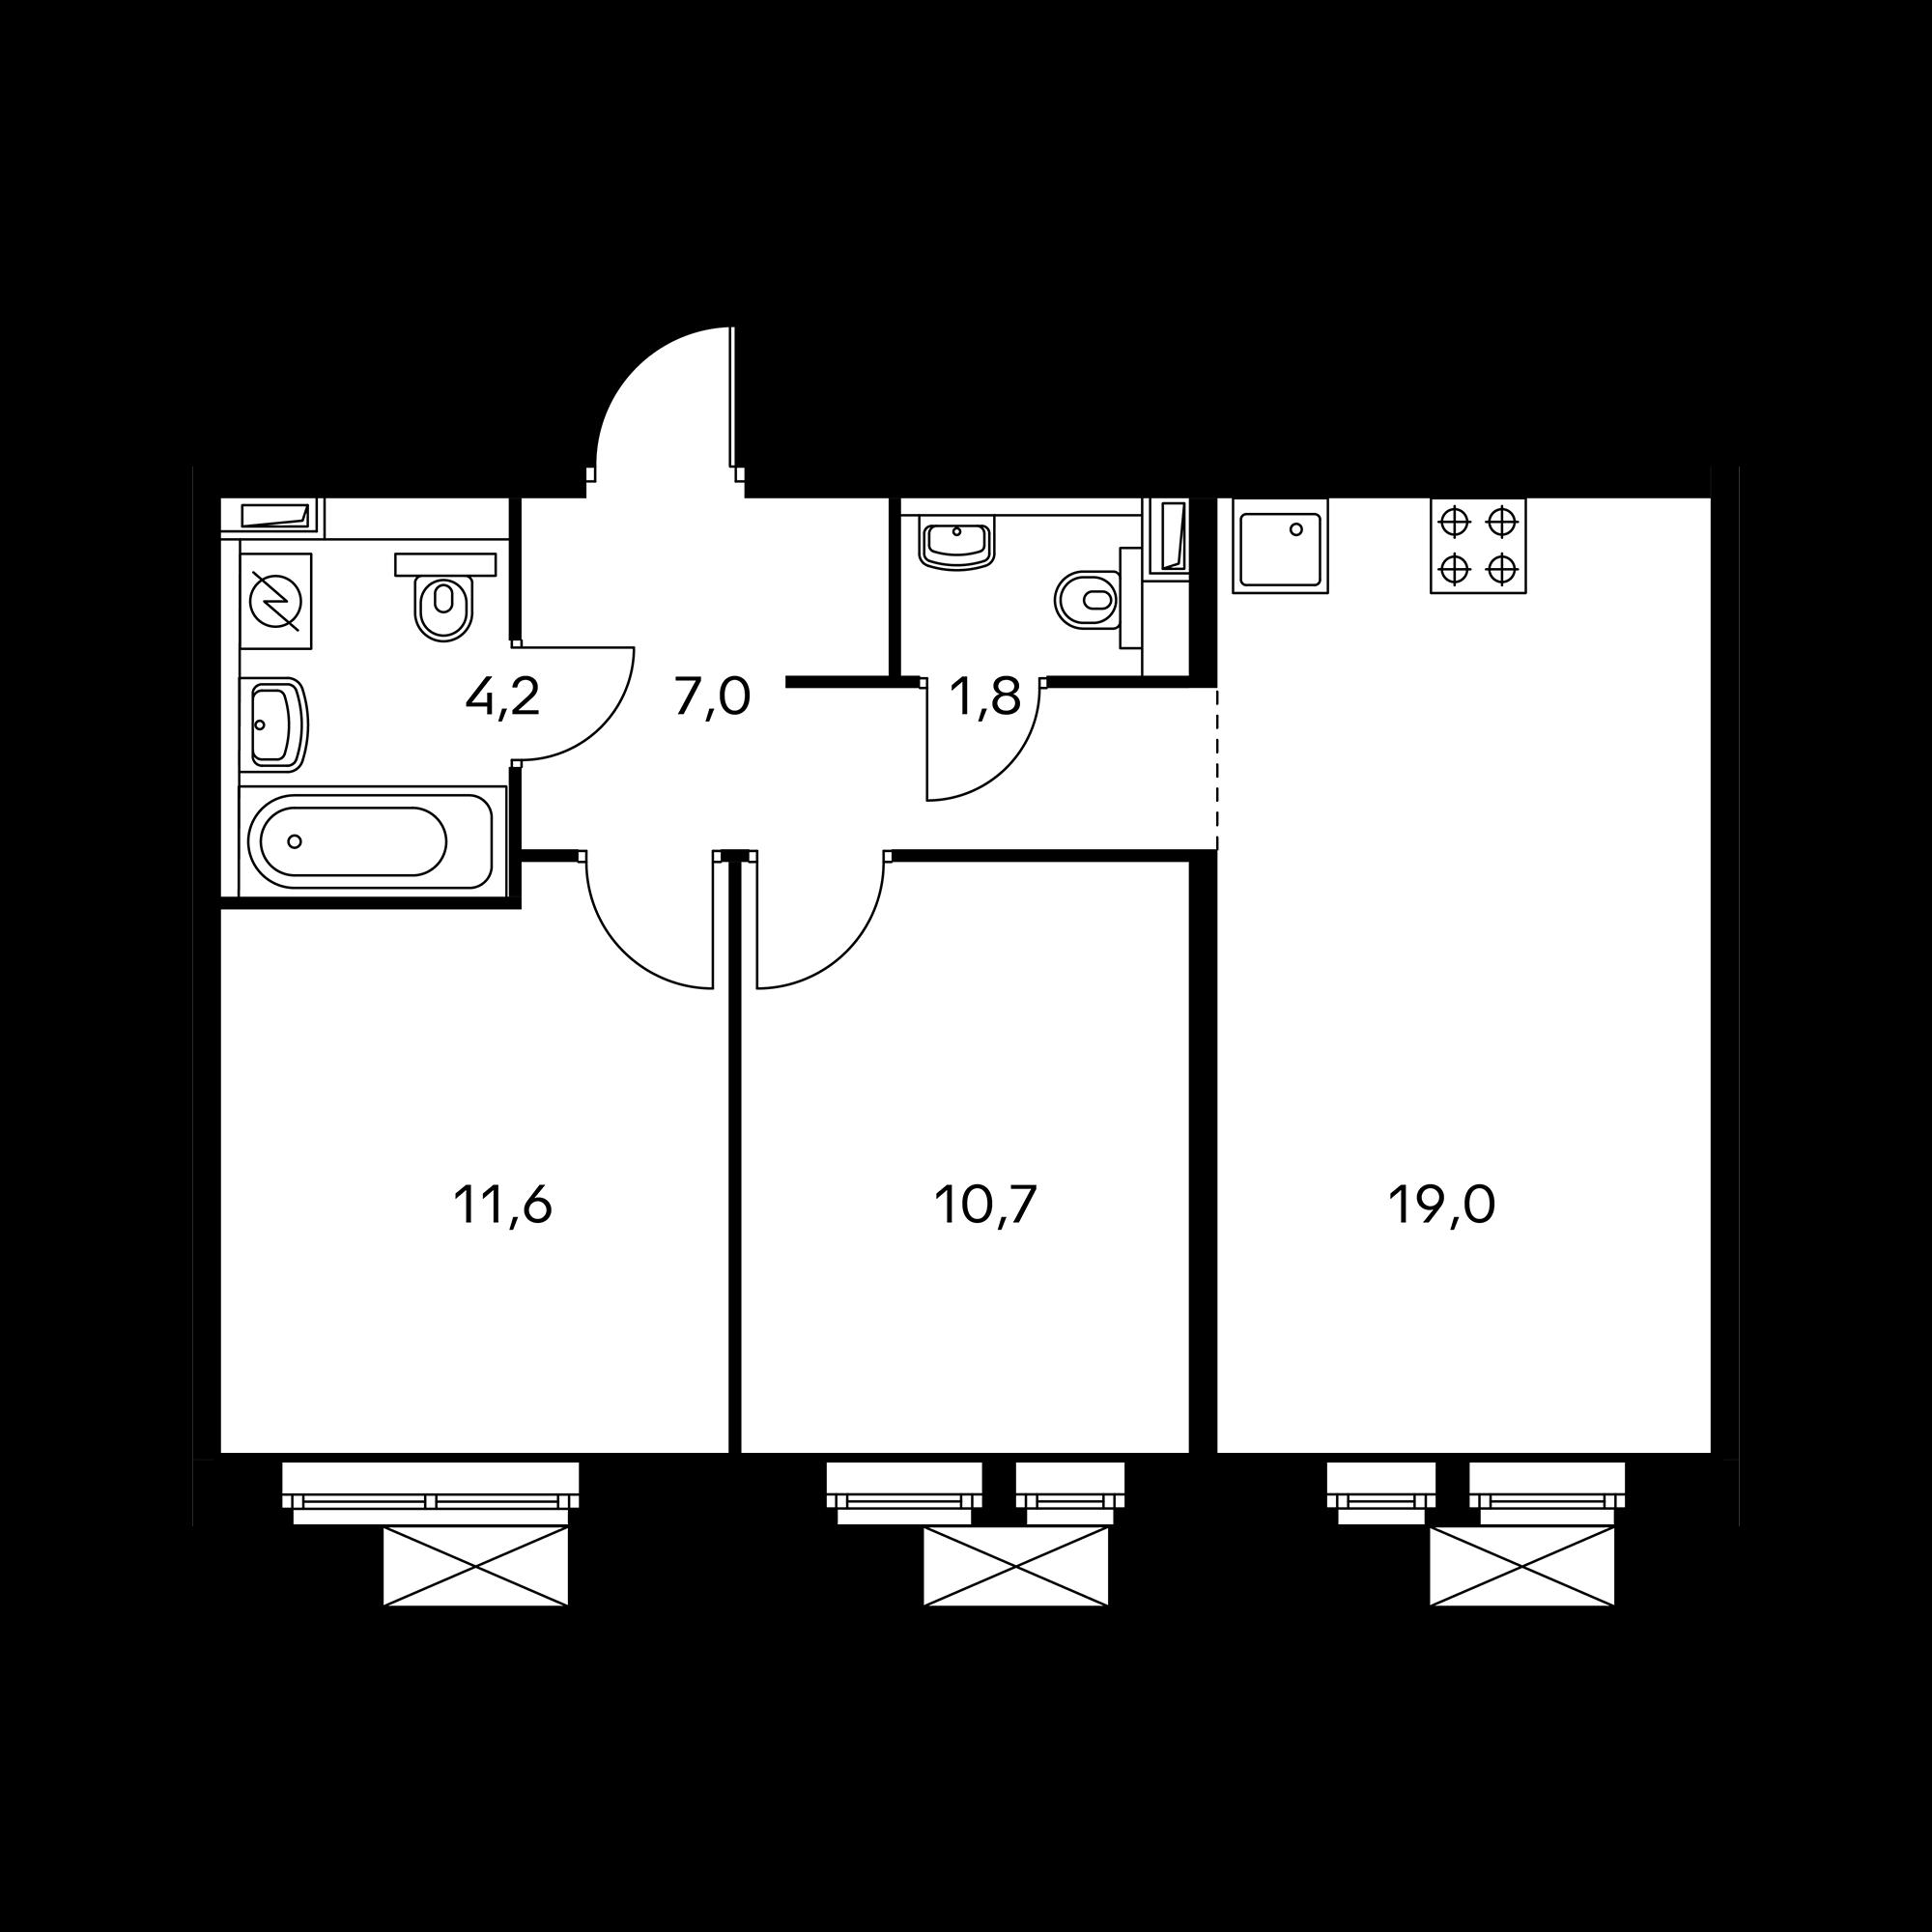 2ES8_9.6-1_3